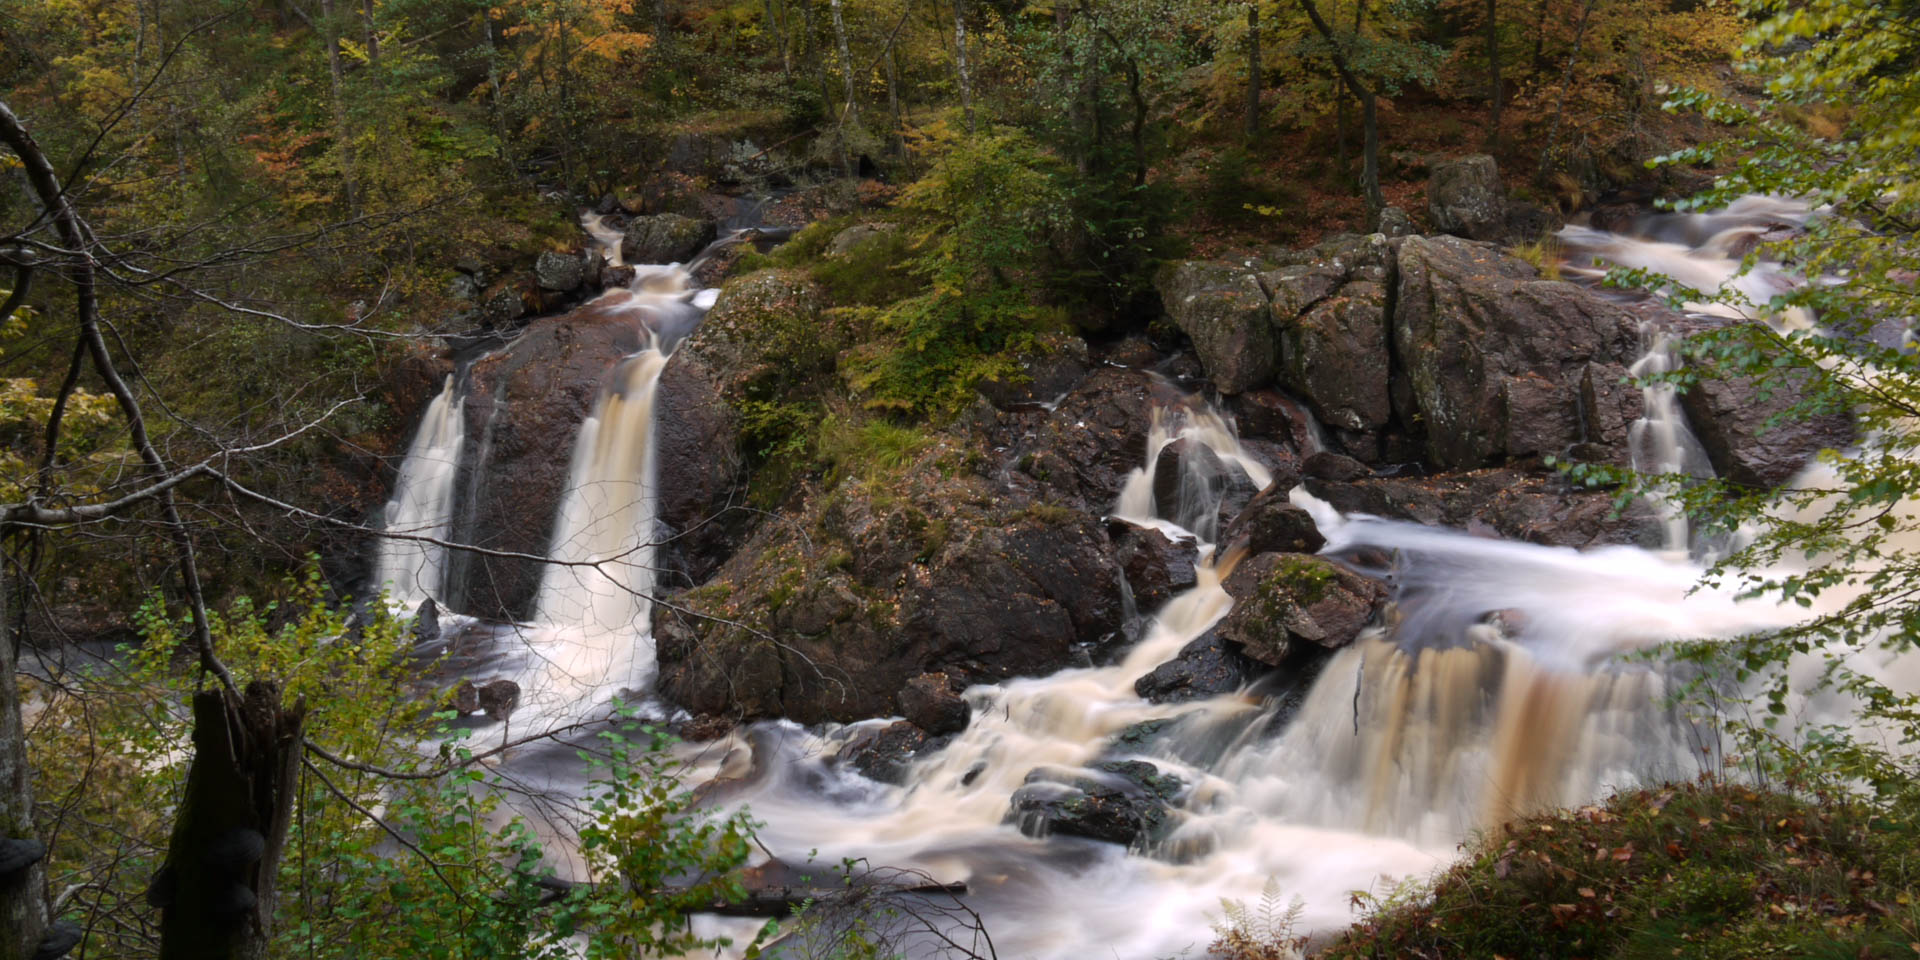 Danska Falls Naturreservat 2009